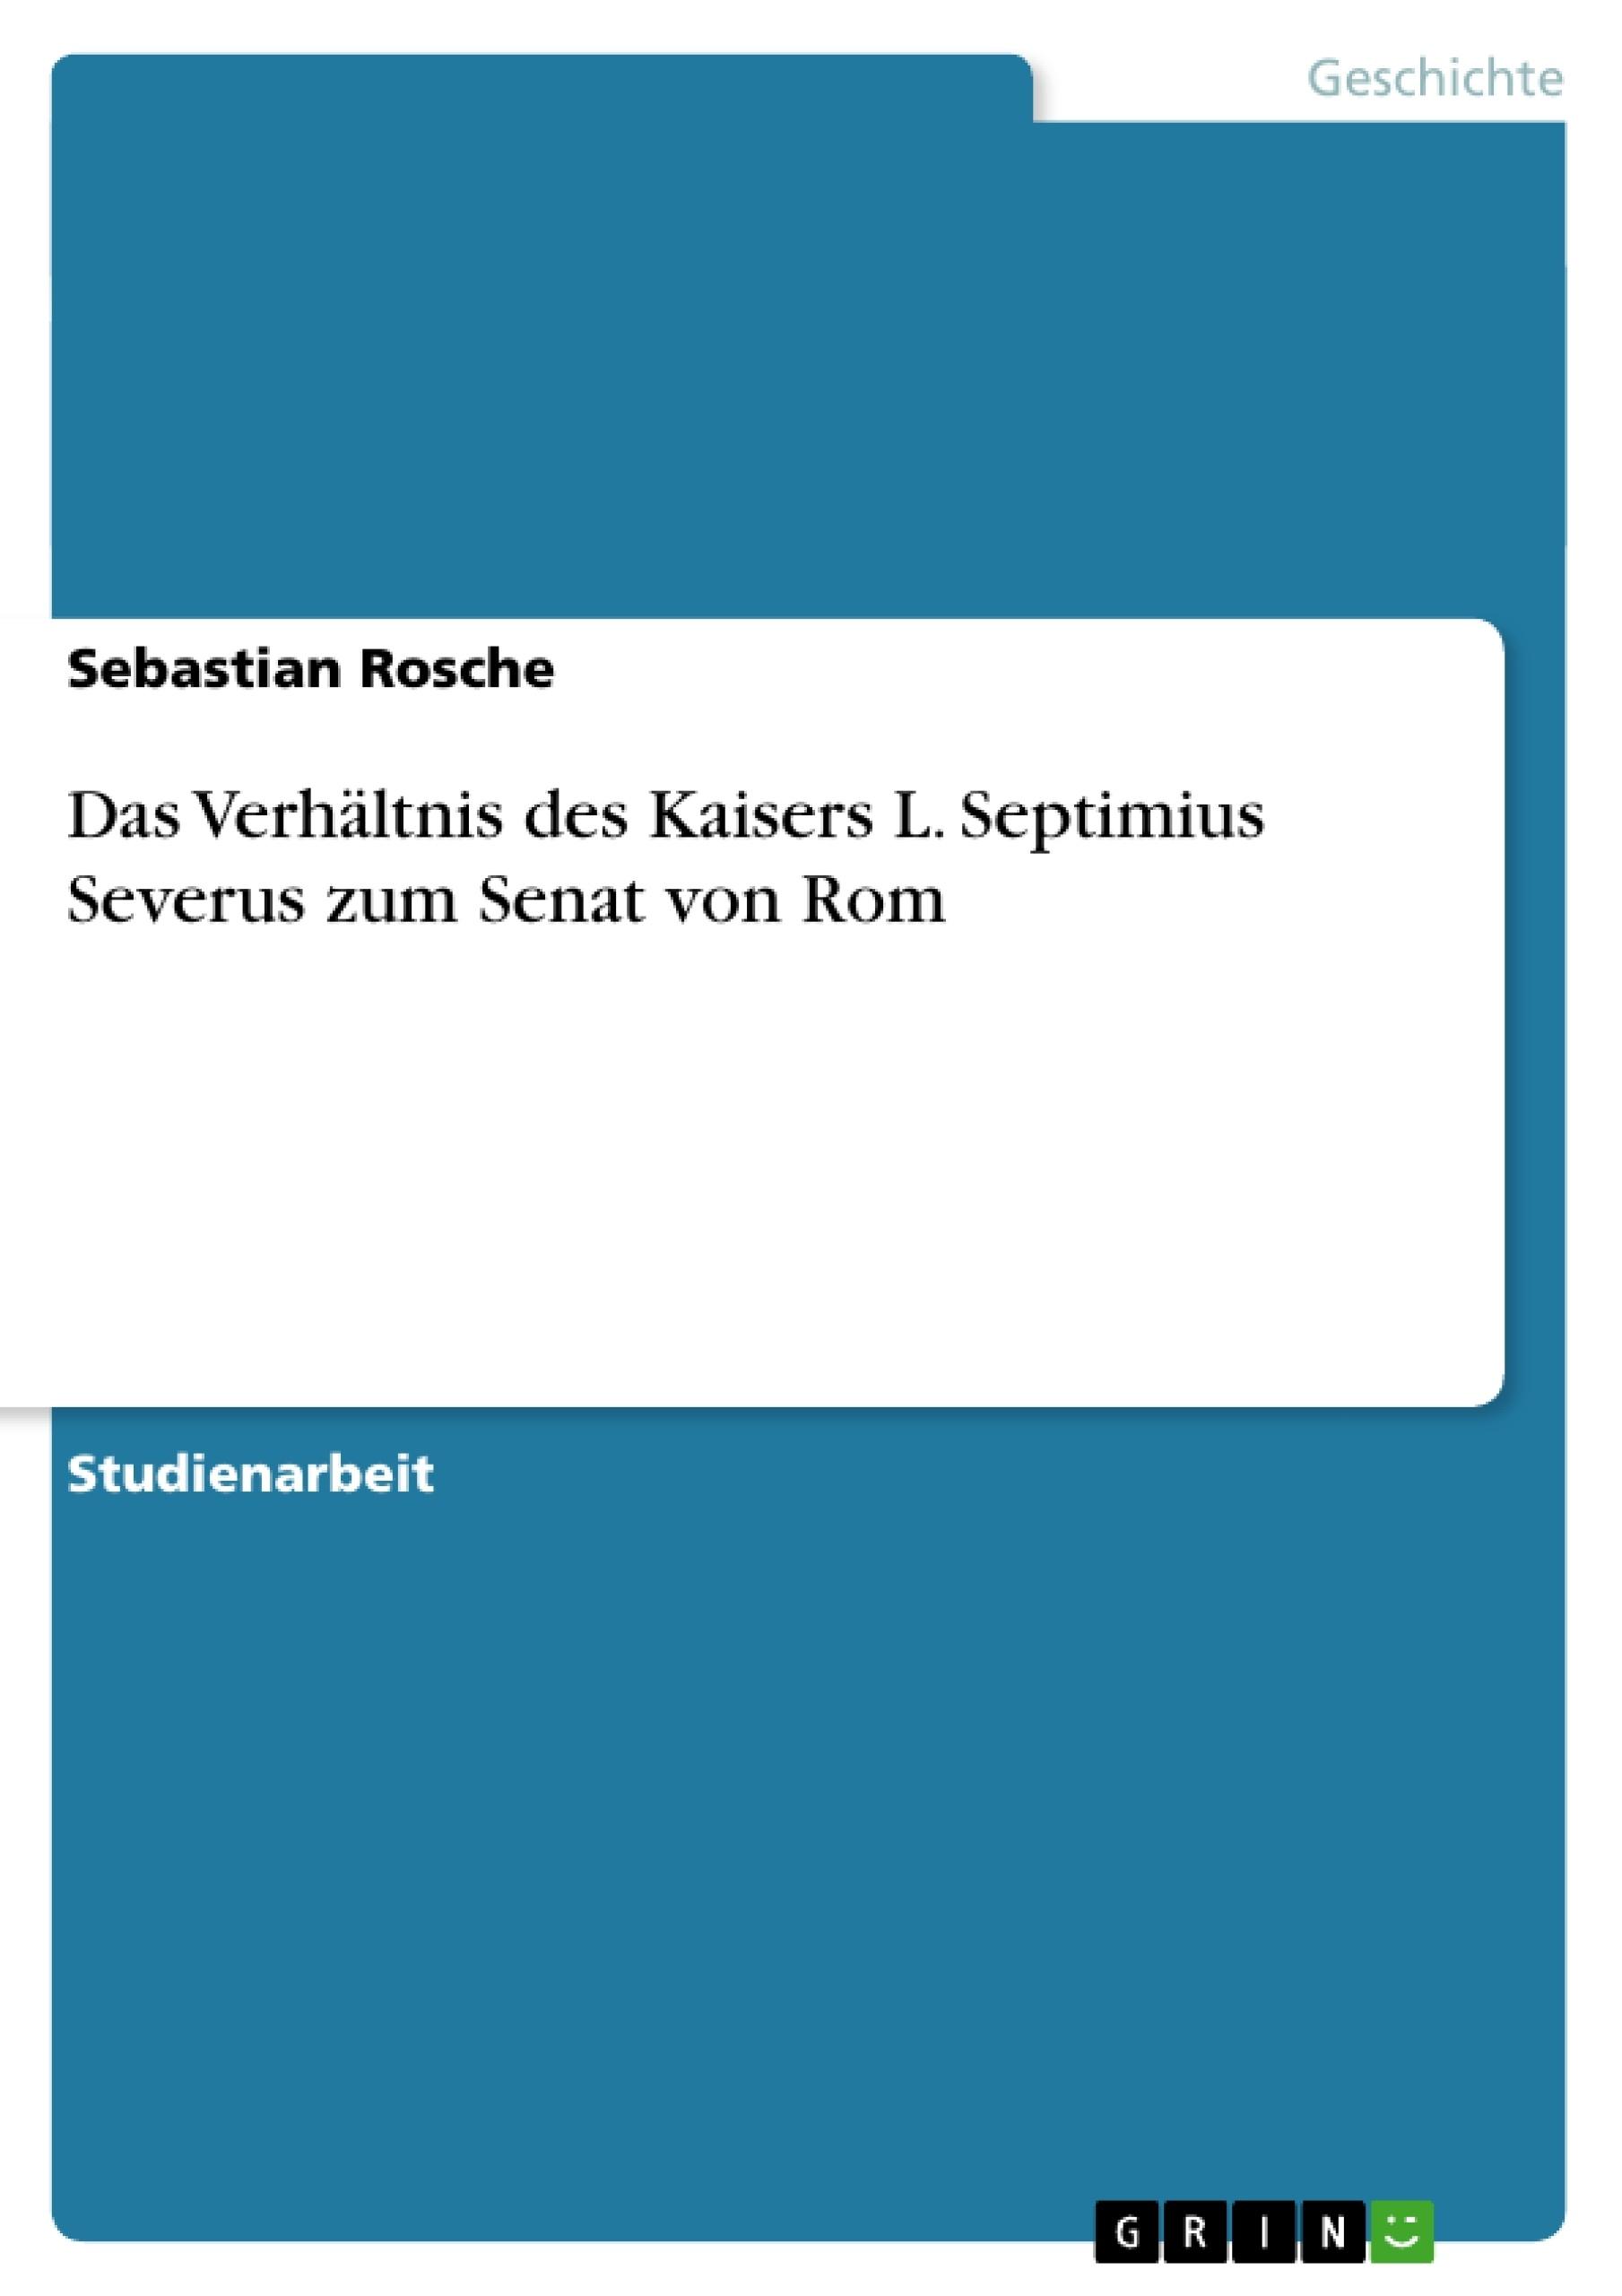 Titel: Das Verhältnis des Kaisers L. Septimius Severus zum Senat von Rom